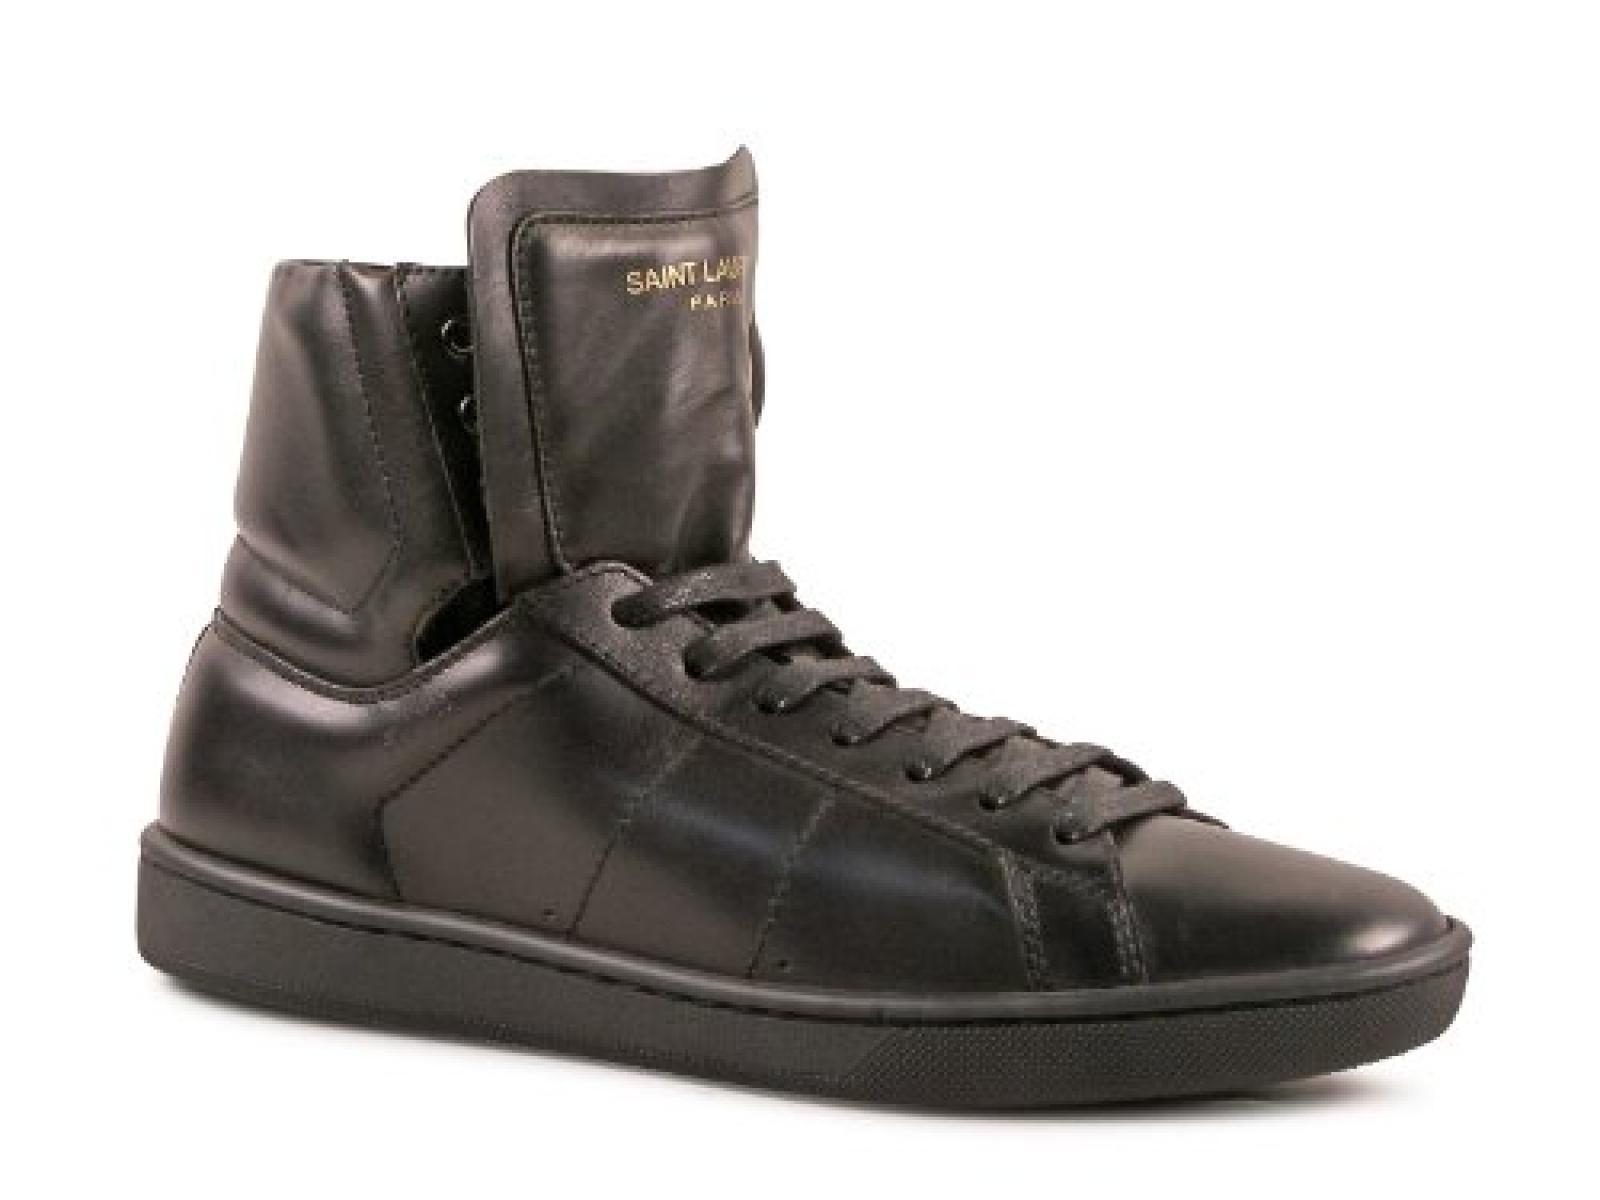 Saint Laurent Frauen hi-Top Sneakers aus schwarzem Leder - Modellnummer: 316242 AQI00 1000